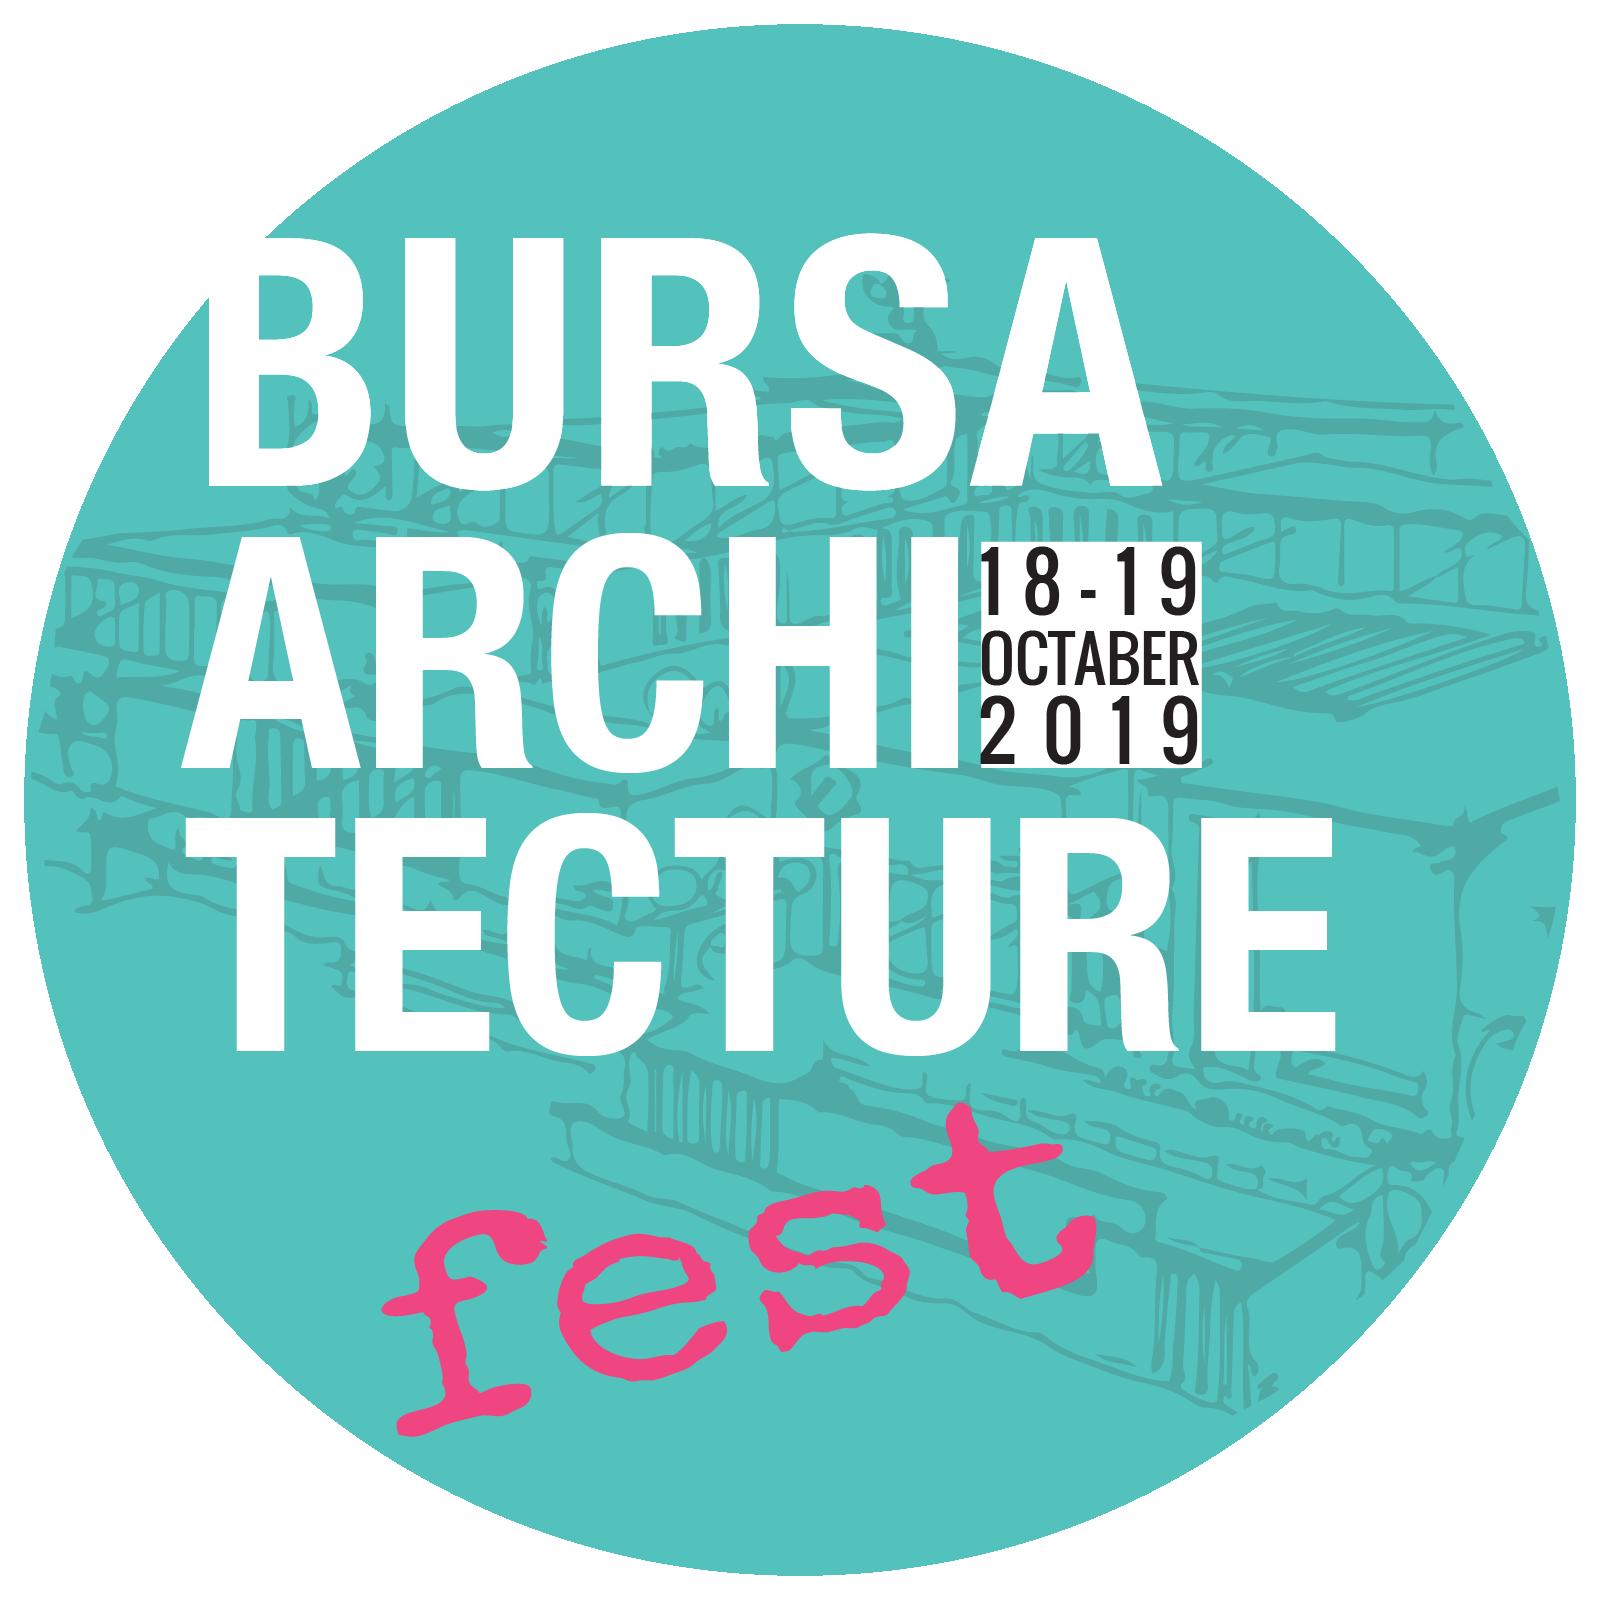 Bursa Architecture Fest 2019